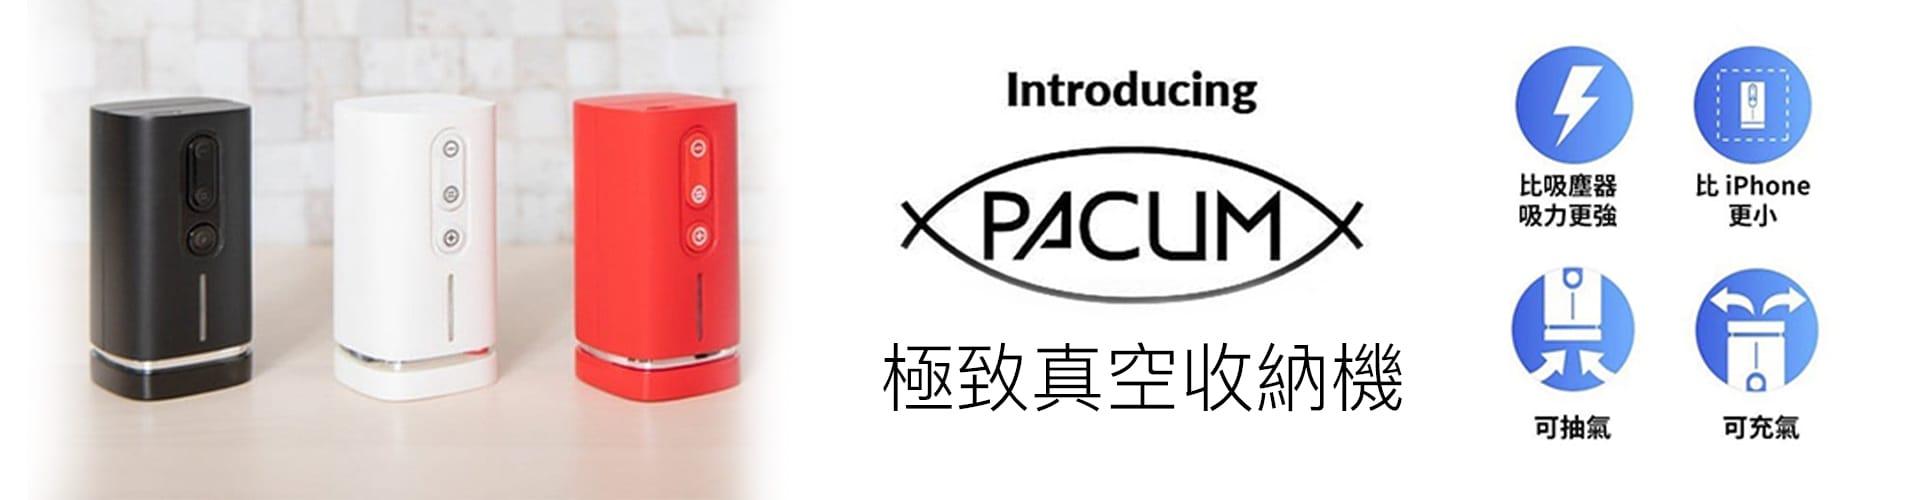 Pacum極致真空收納機 抽充兩用